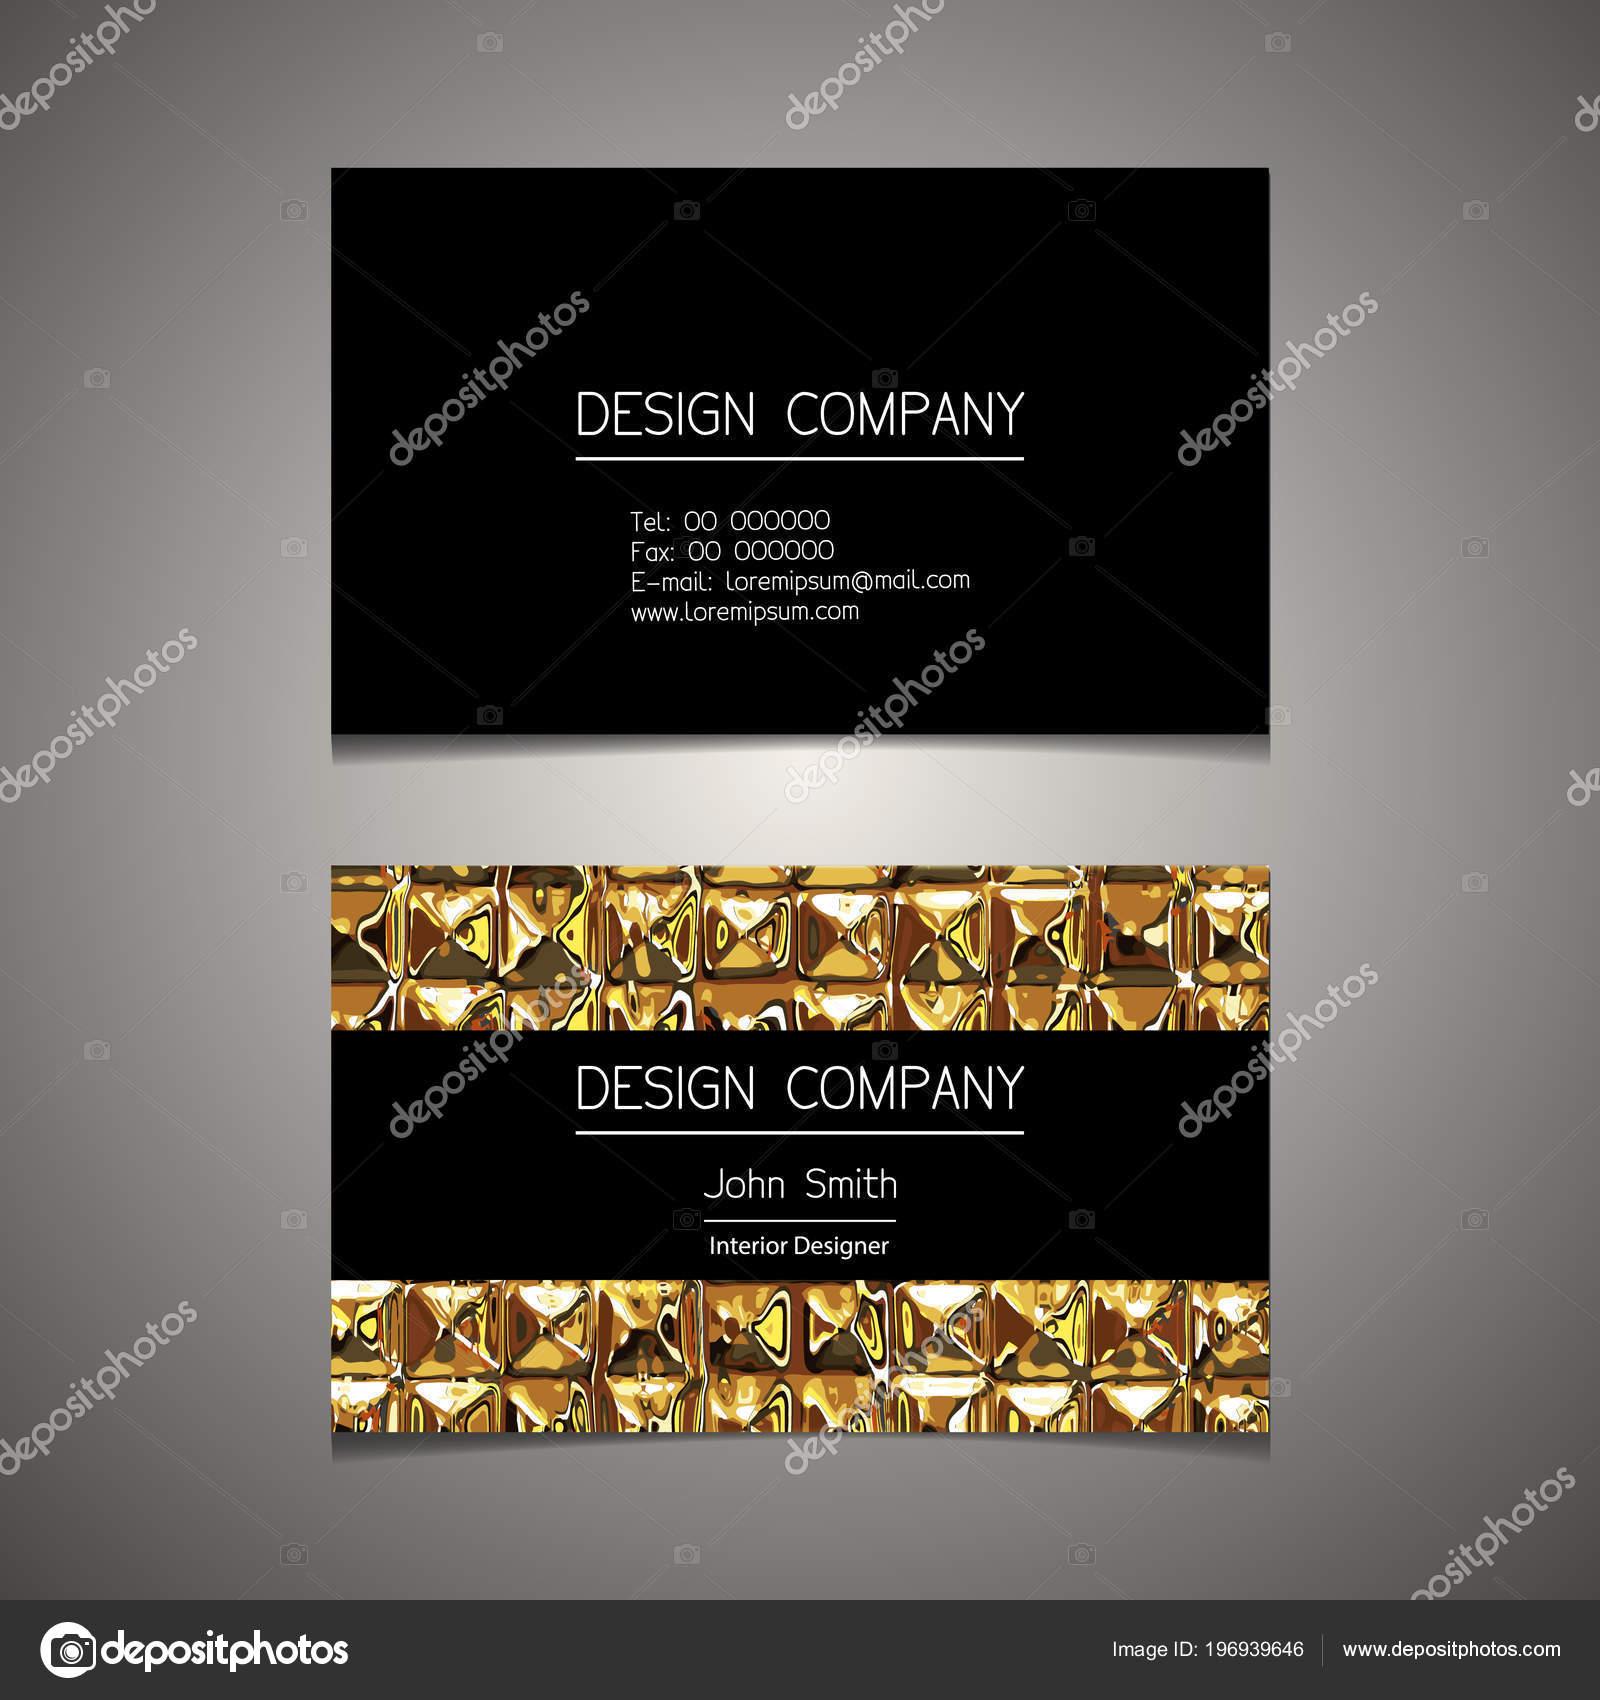 Modele Carte Visite Avec Elegant Design Image Vectorielle